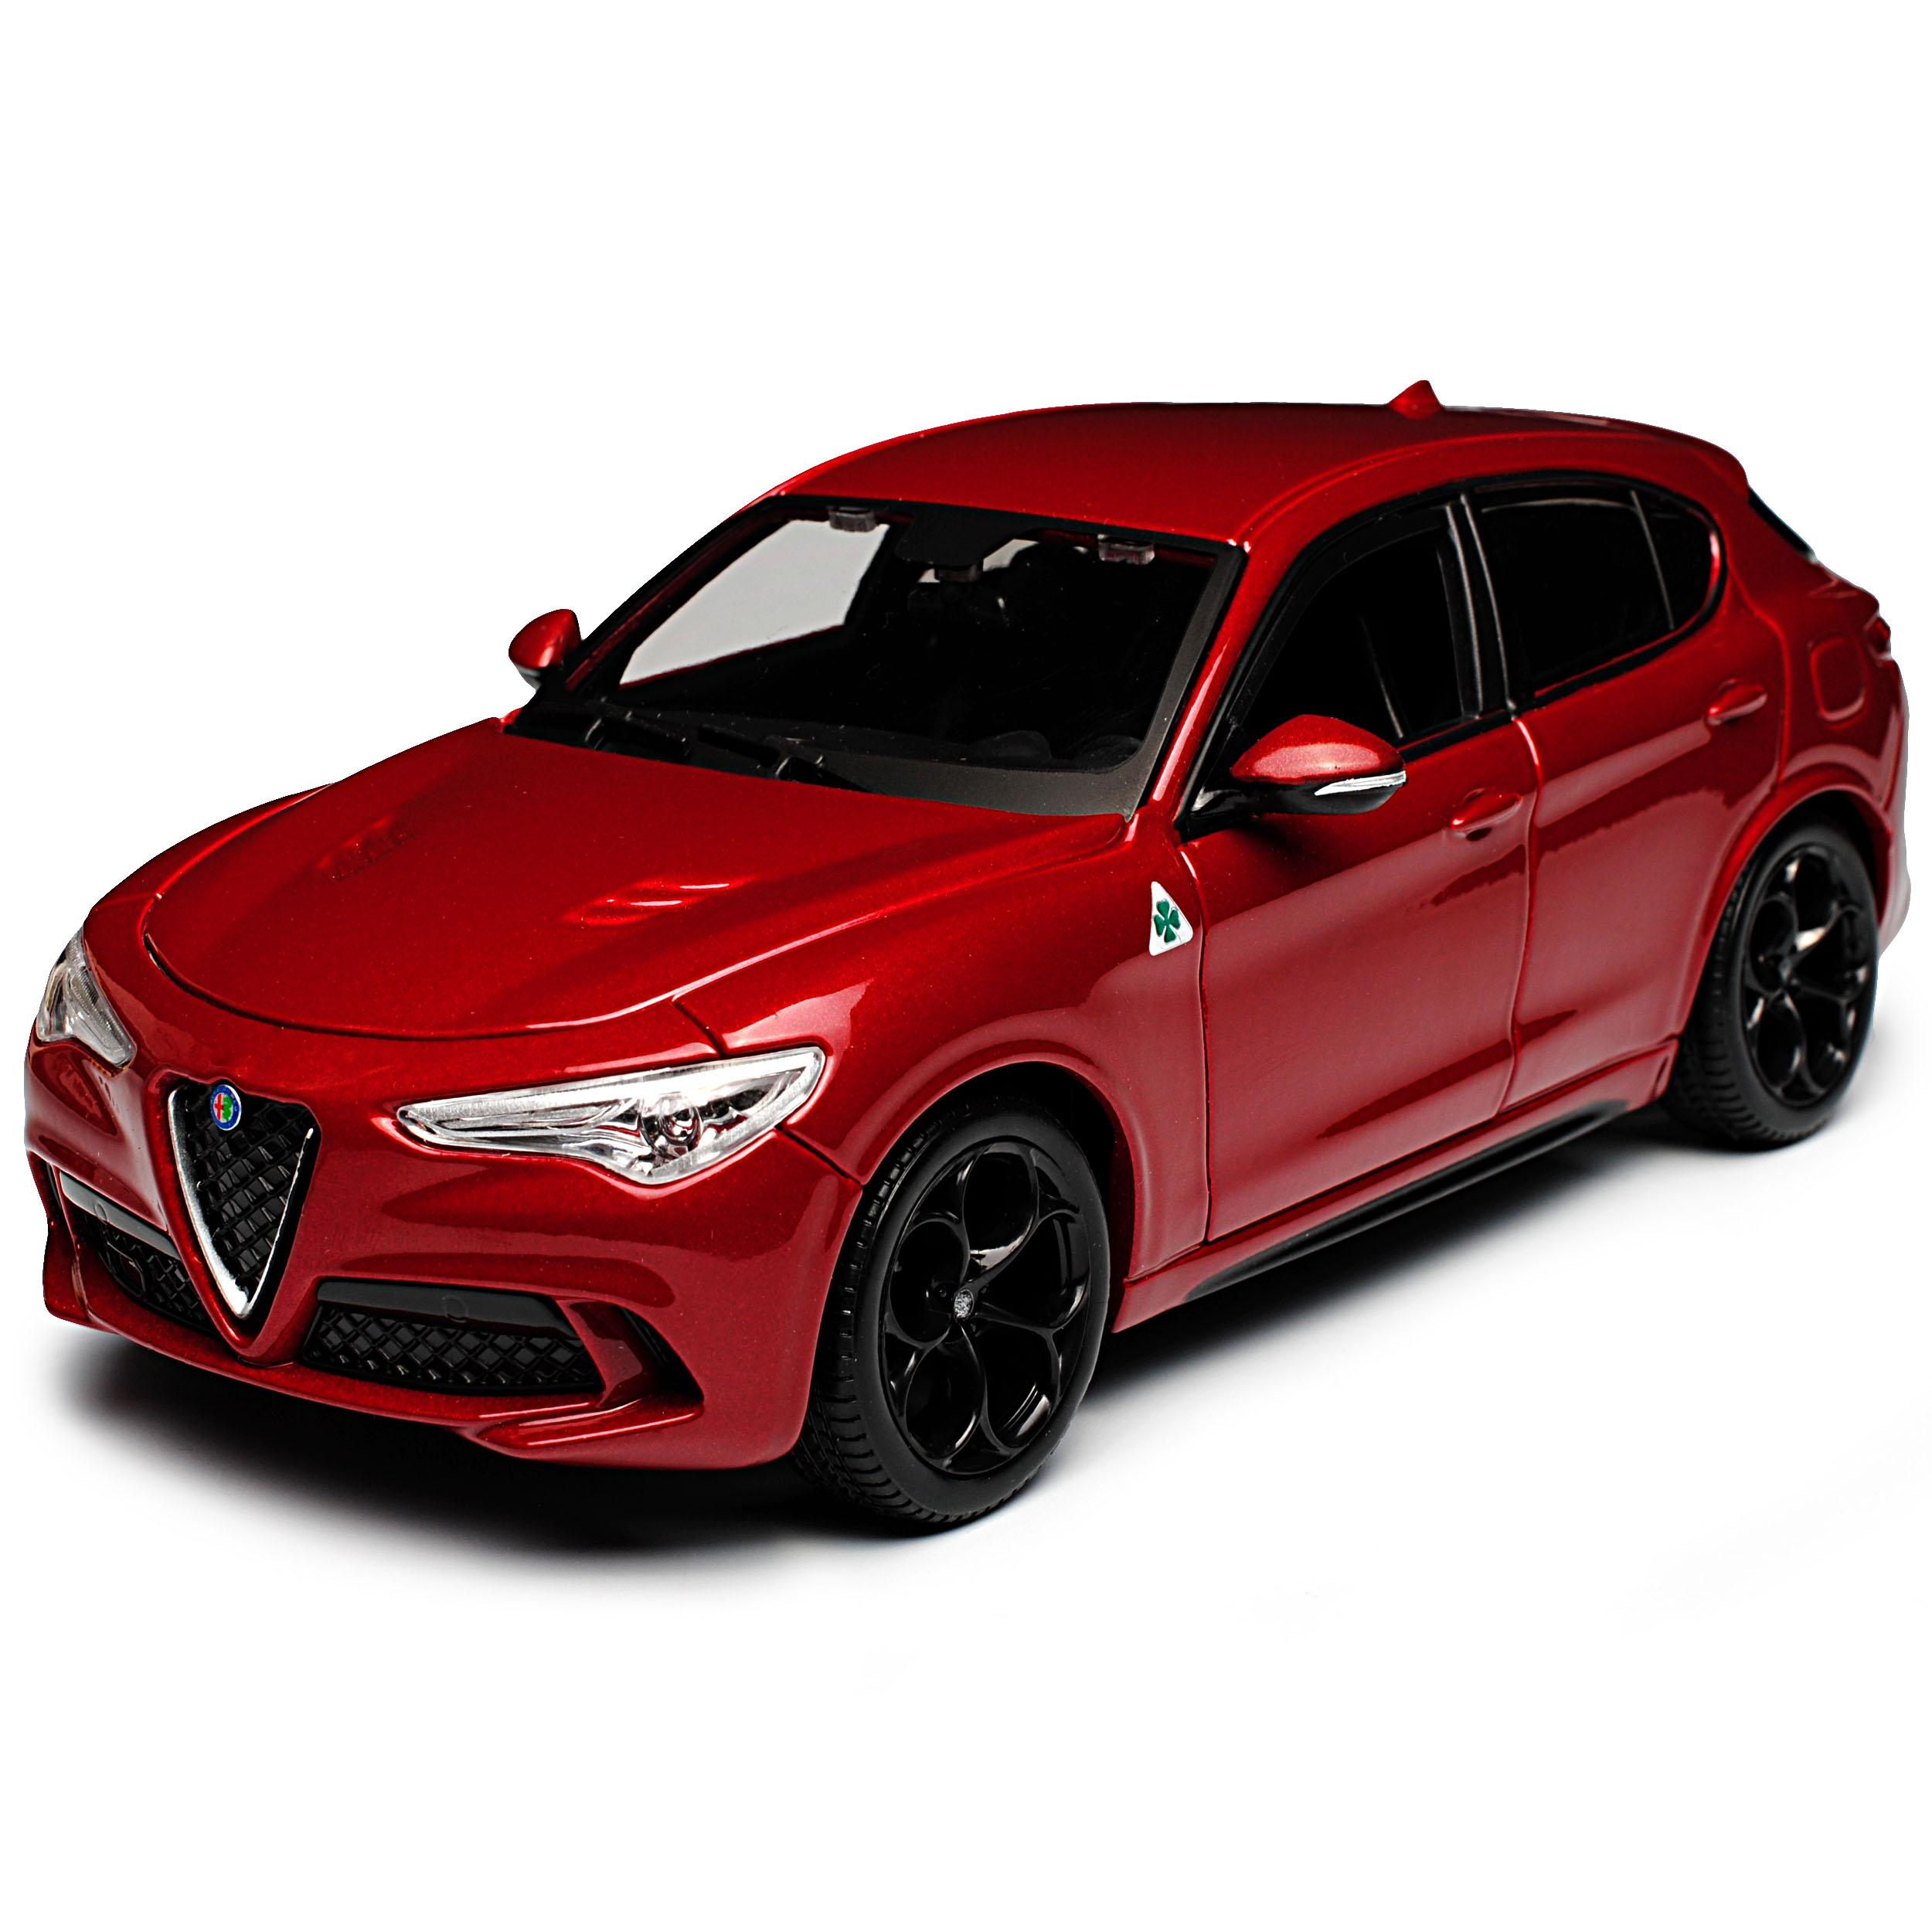 Alfa Romeo Stelvio Typ 949 SUV Rot Metallic Ab 2017 1//24 Bburago Modell Auto m..